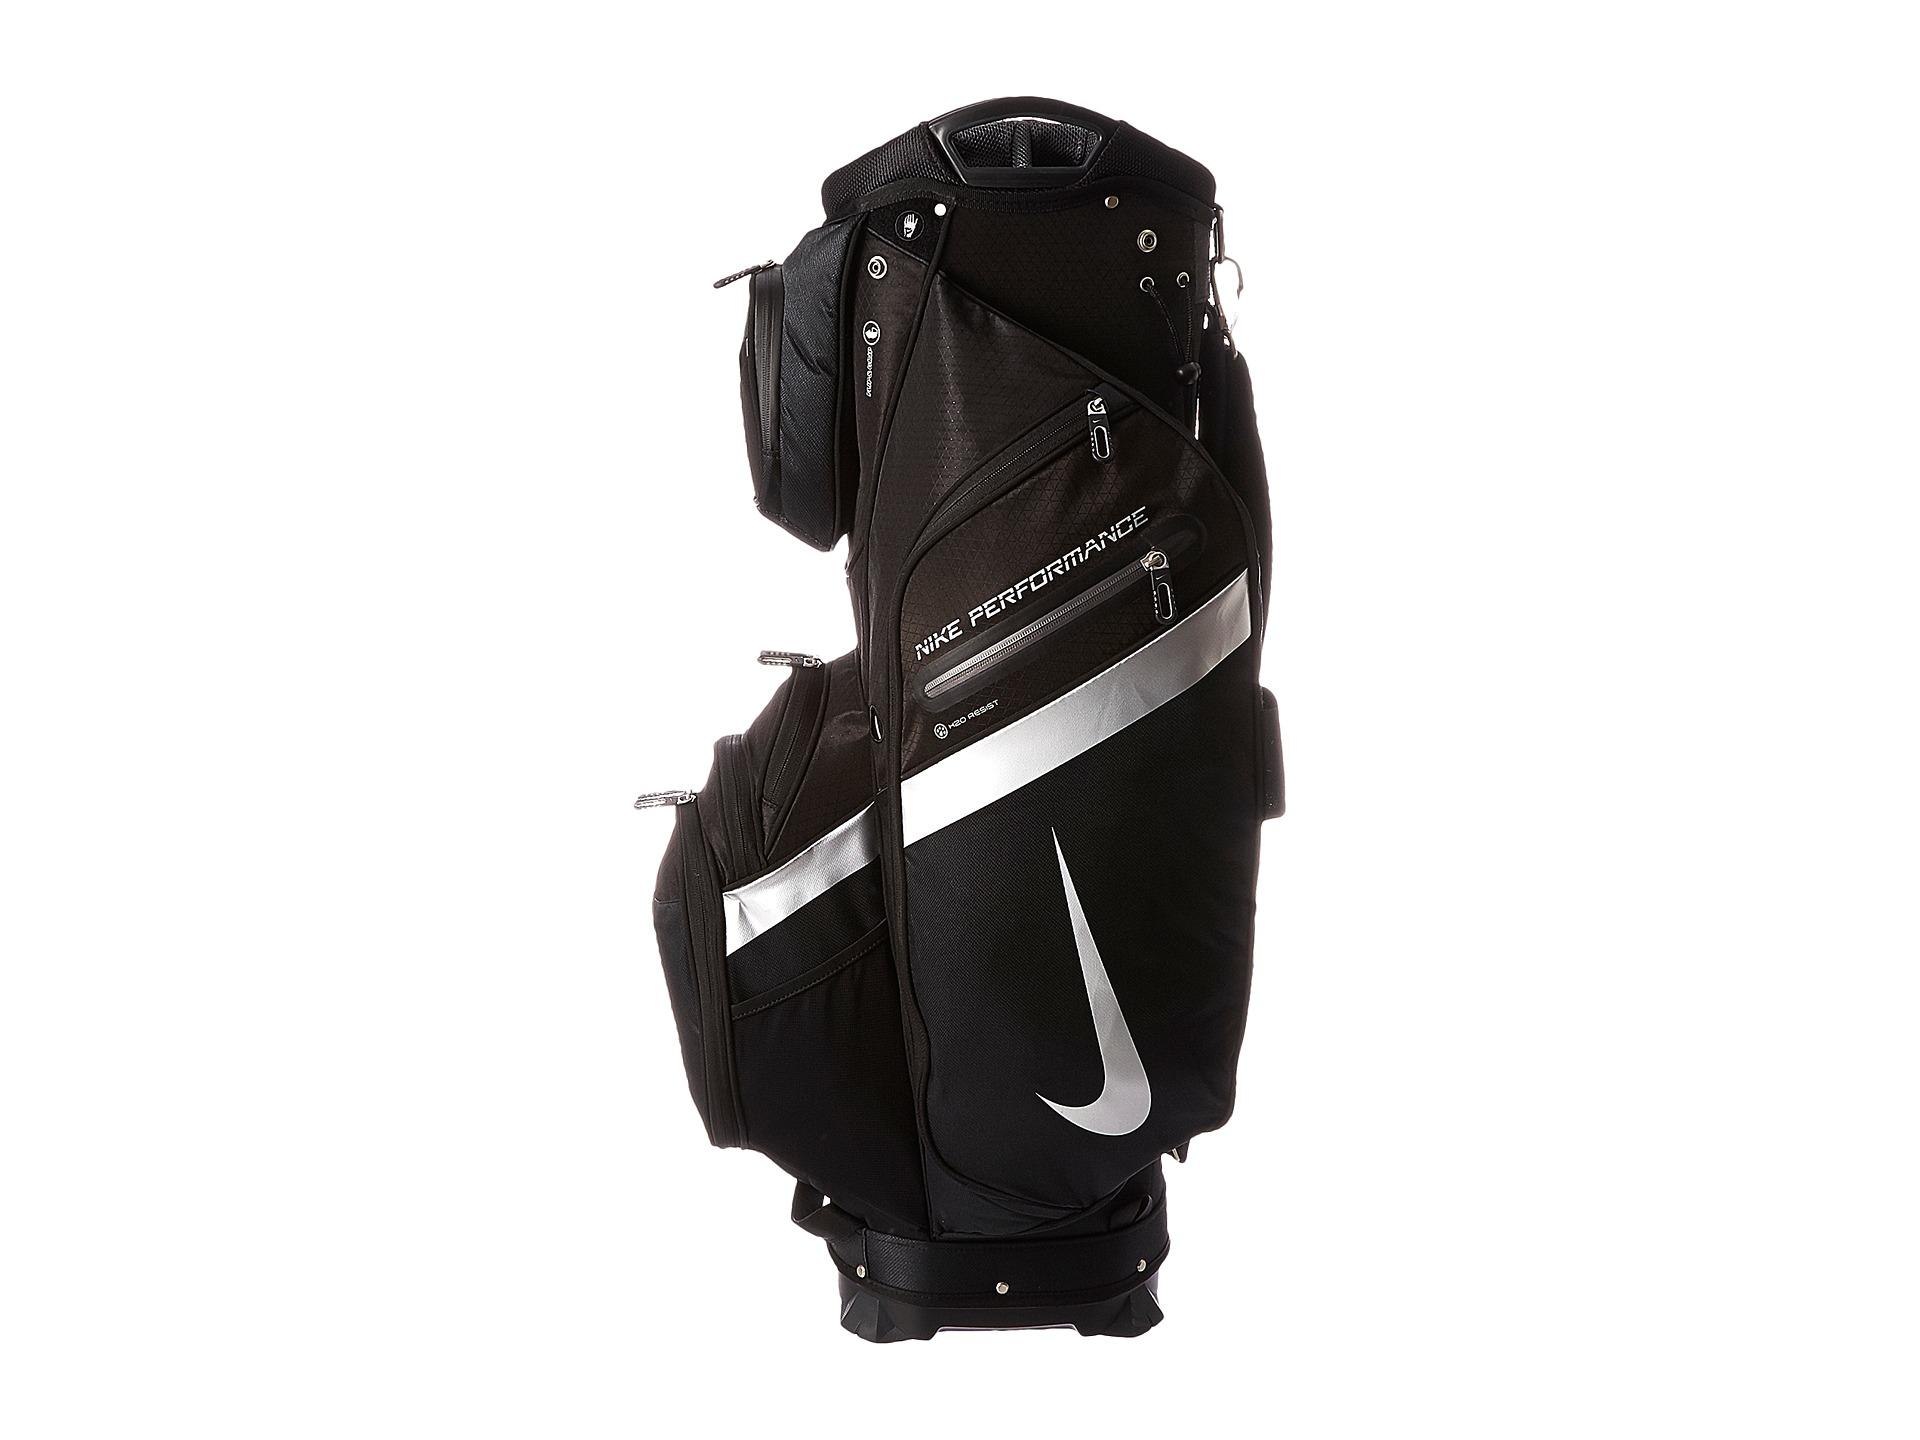 Lyst - Nike Performance Cart Iv in Black for Men 1b3b4dd1b4